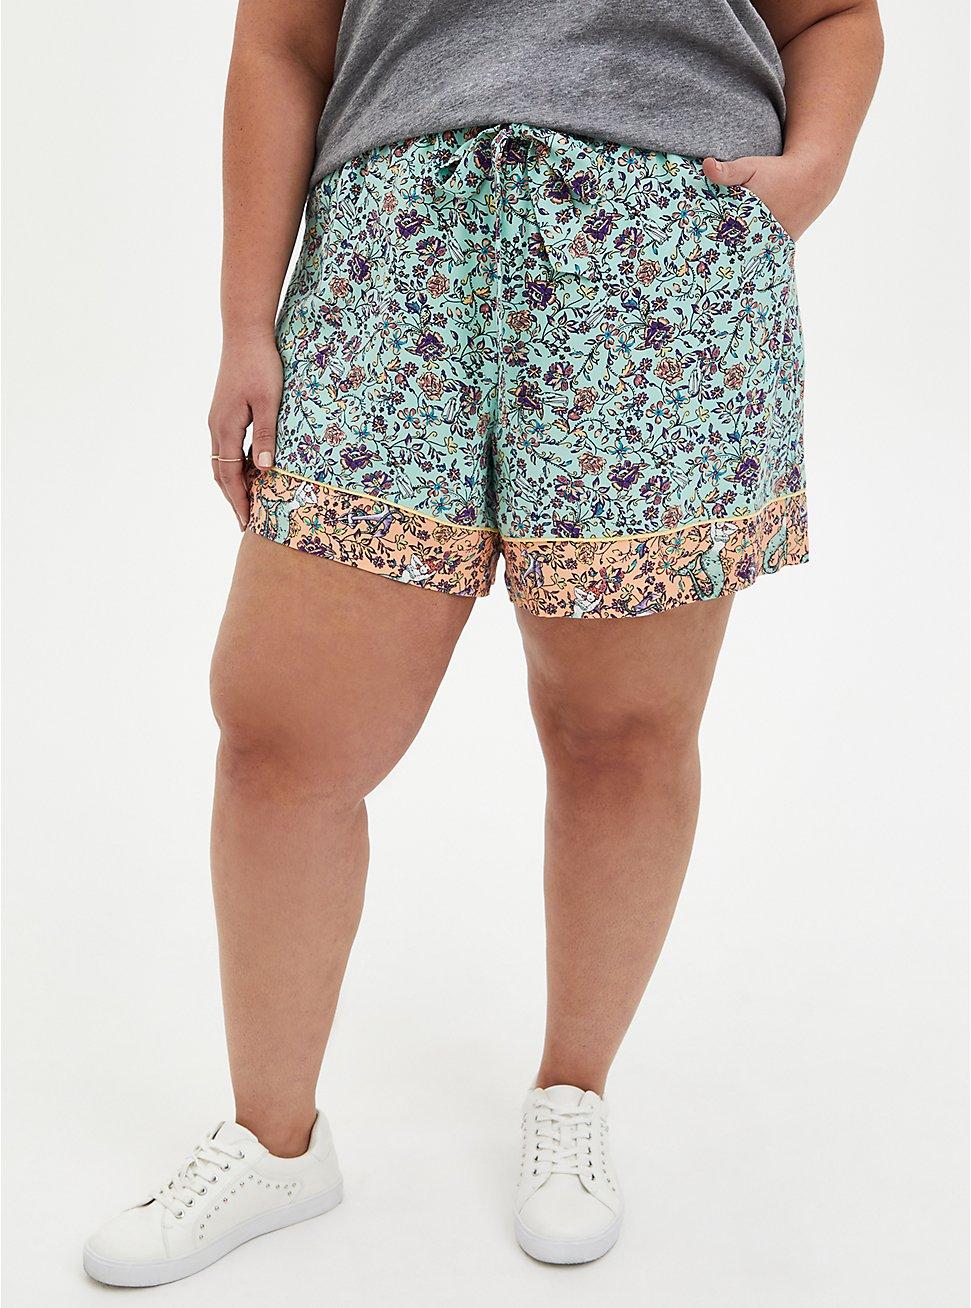 Self-Tie Paperbag Mid Short - Challis Floral Jade Green, MULTI FORAL, hi-res